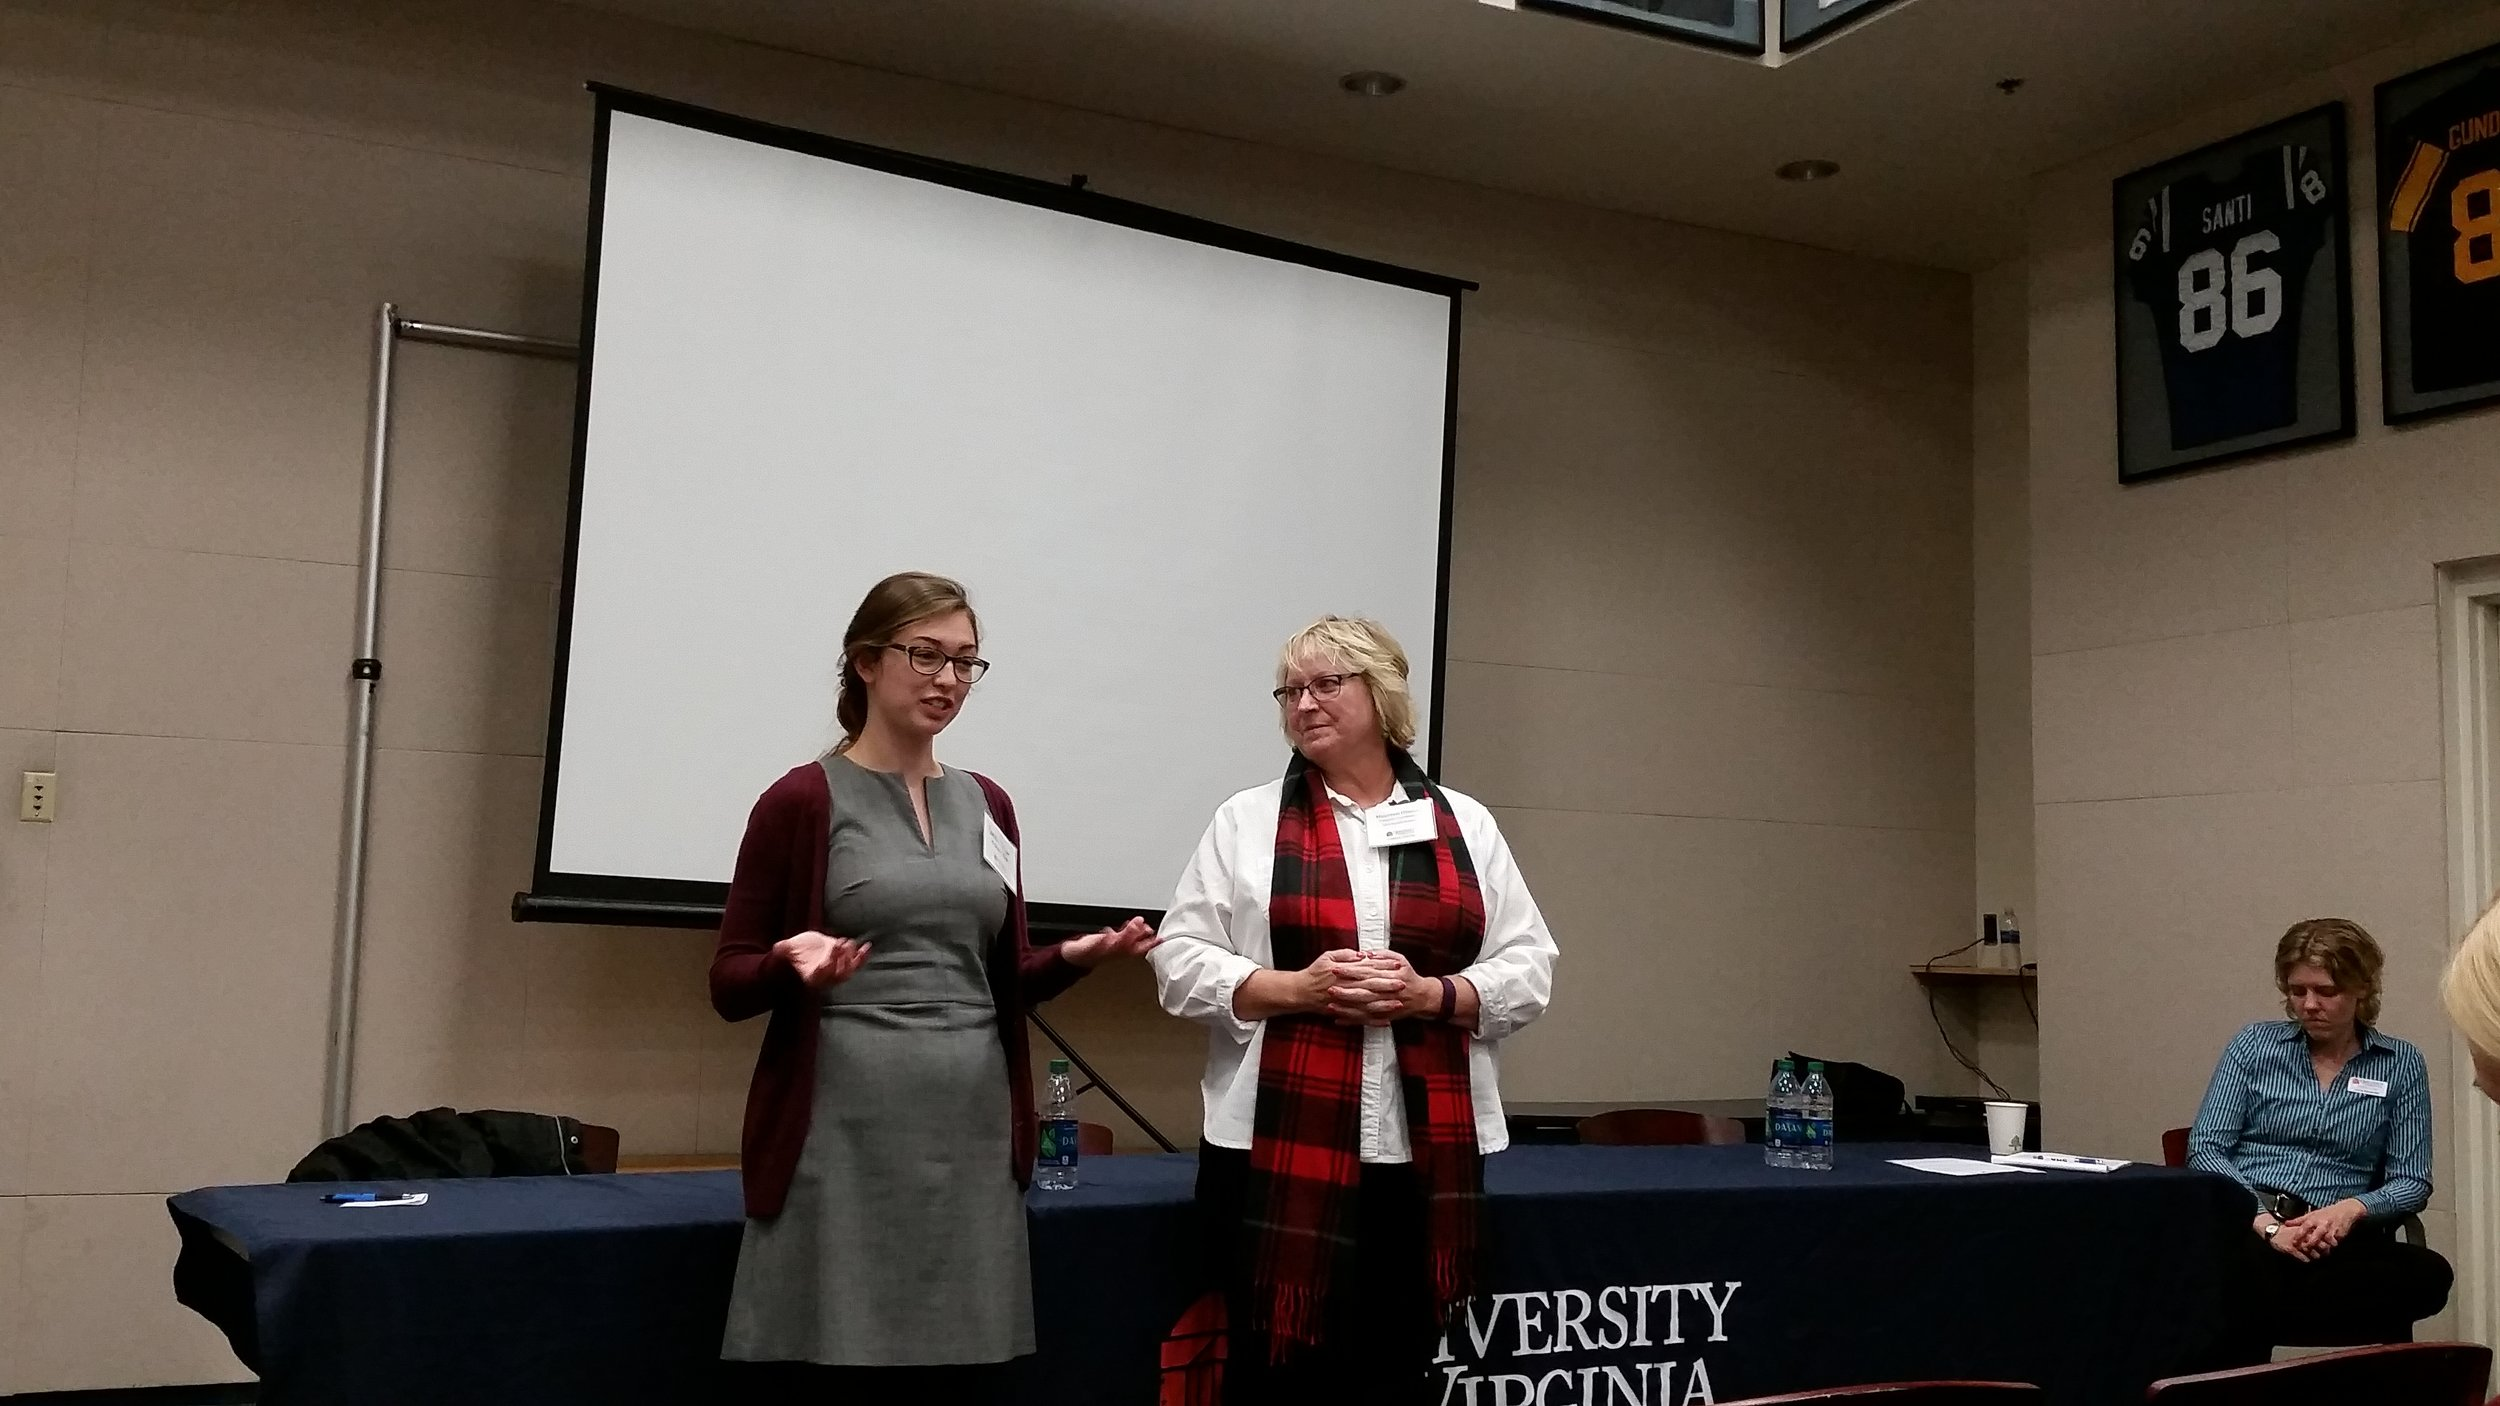 Sarah Olijar, UVA student and Madison House Head Program Director, presented on volunteer management.